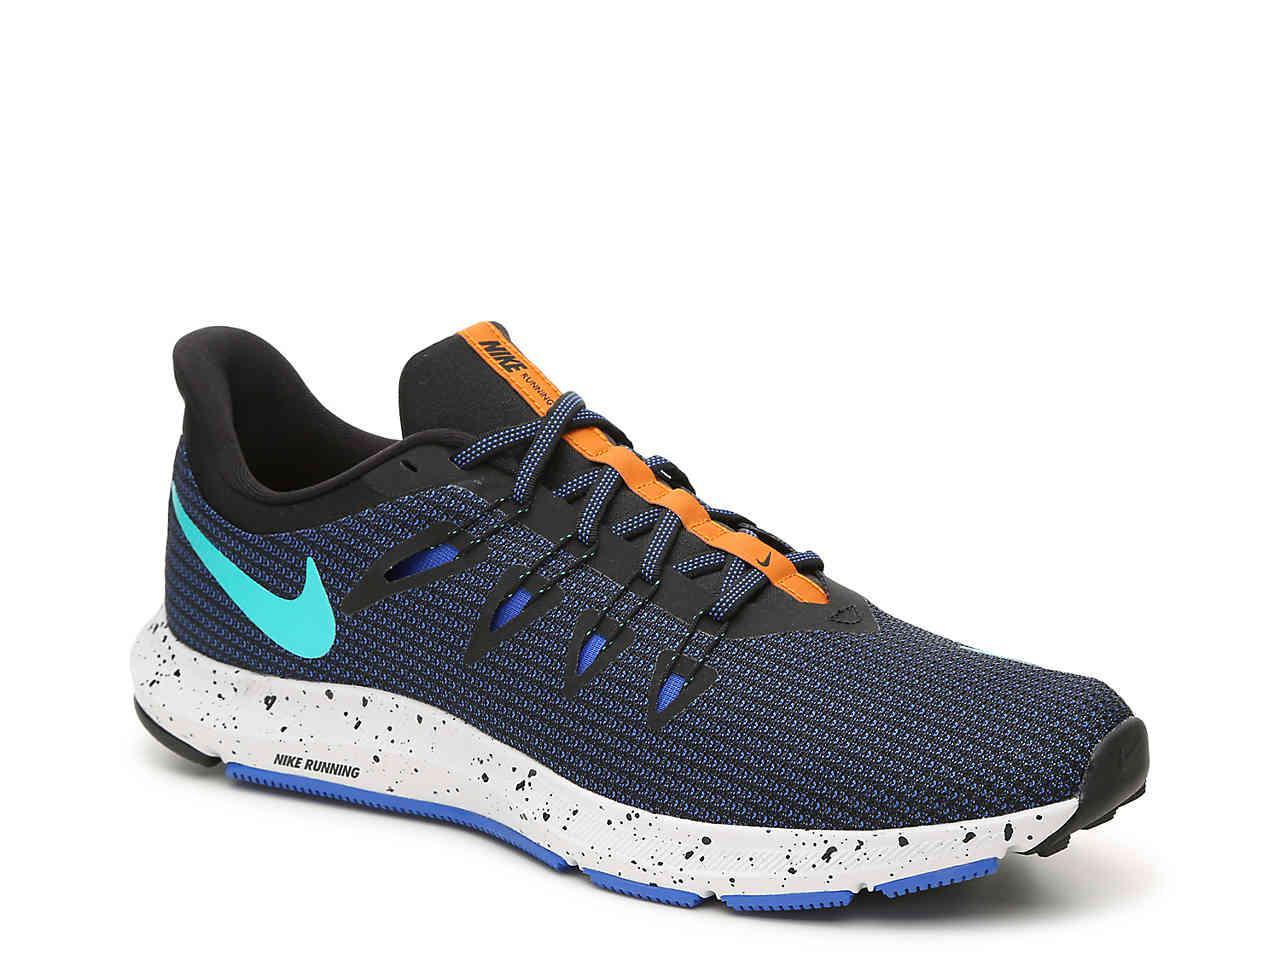 62e2f3f7864fc ... Athletic Nike Nike Zoom Winflo 3 Premium Lightweight Running Shoe DSW-354331   Lyst - Nike Quest Se Lightweight Running Shoe in Blue for Men ...